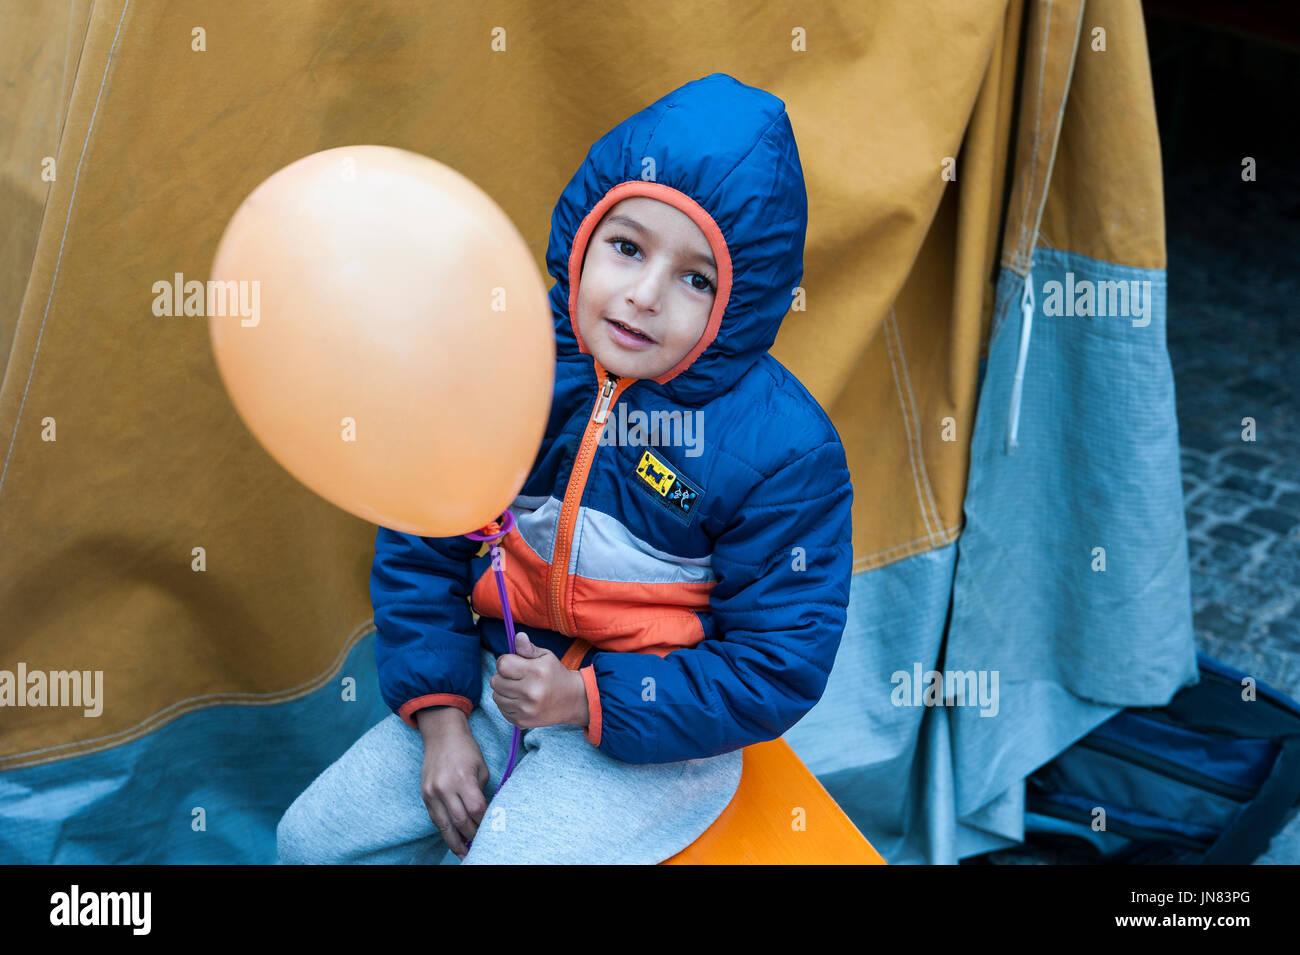 War Refugee Stock Photos & War Refugee Stock Images - Alamy